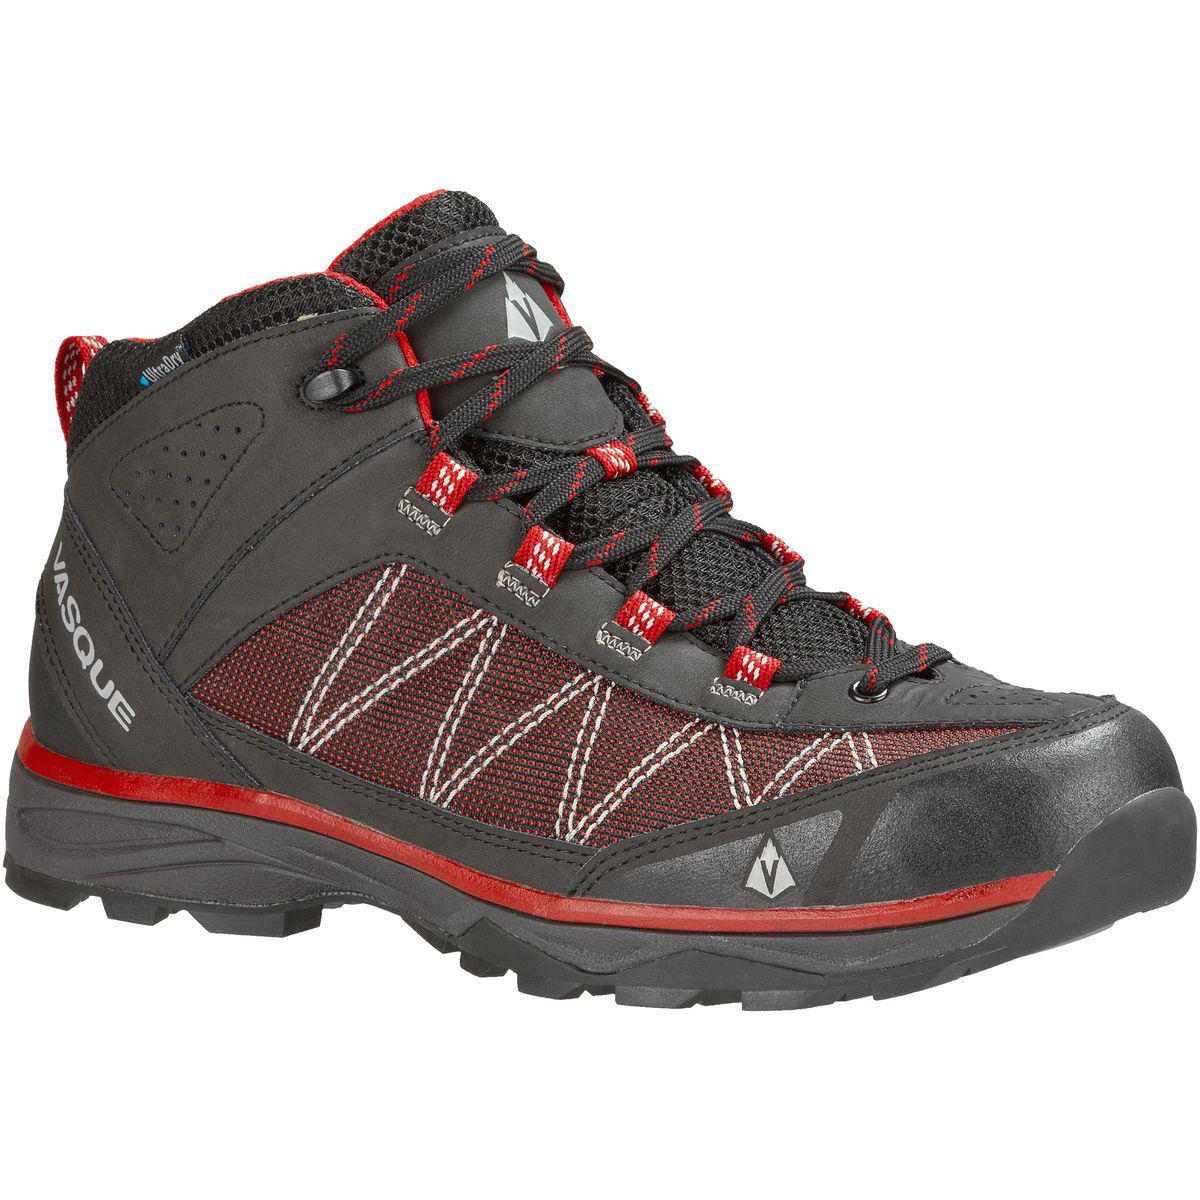 28948650c72 Lyst - Vasque Monolith Ultradry Hiking Boot for Men